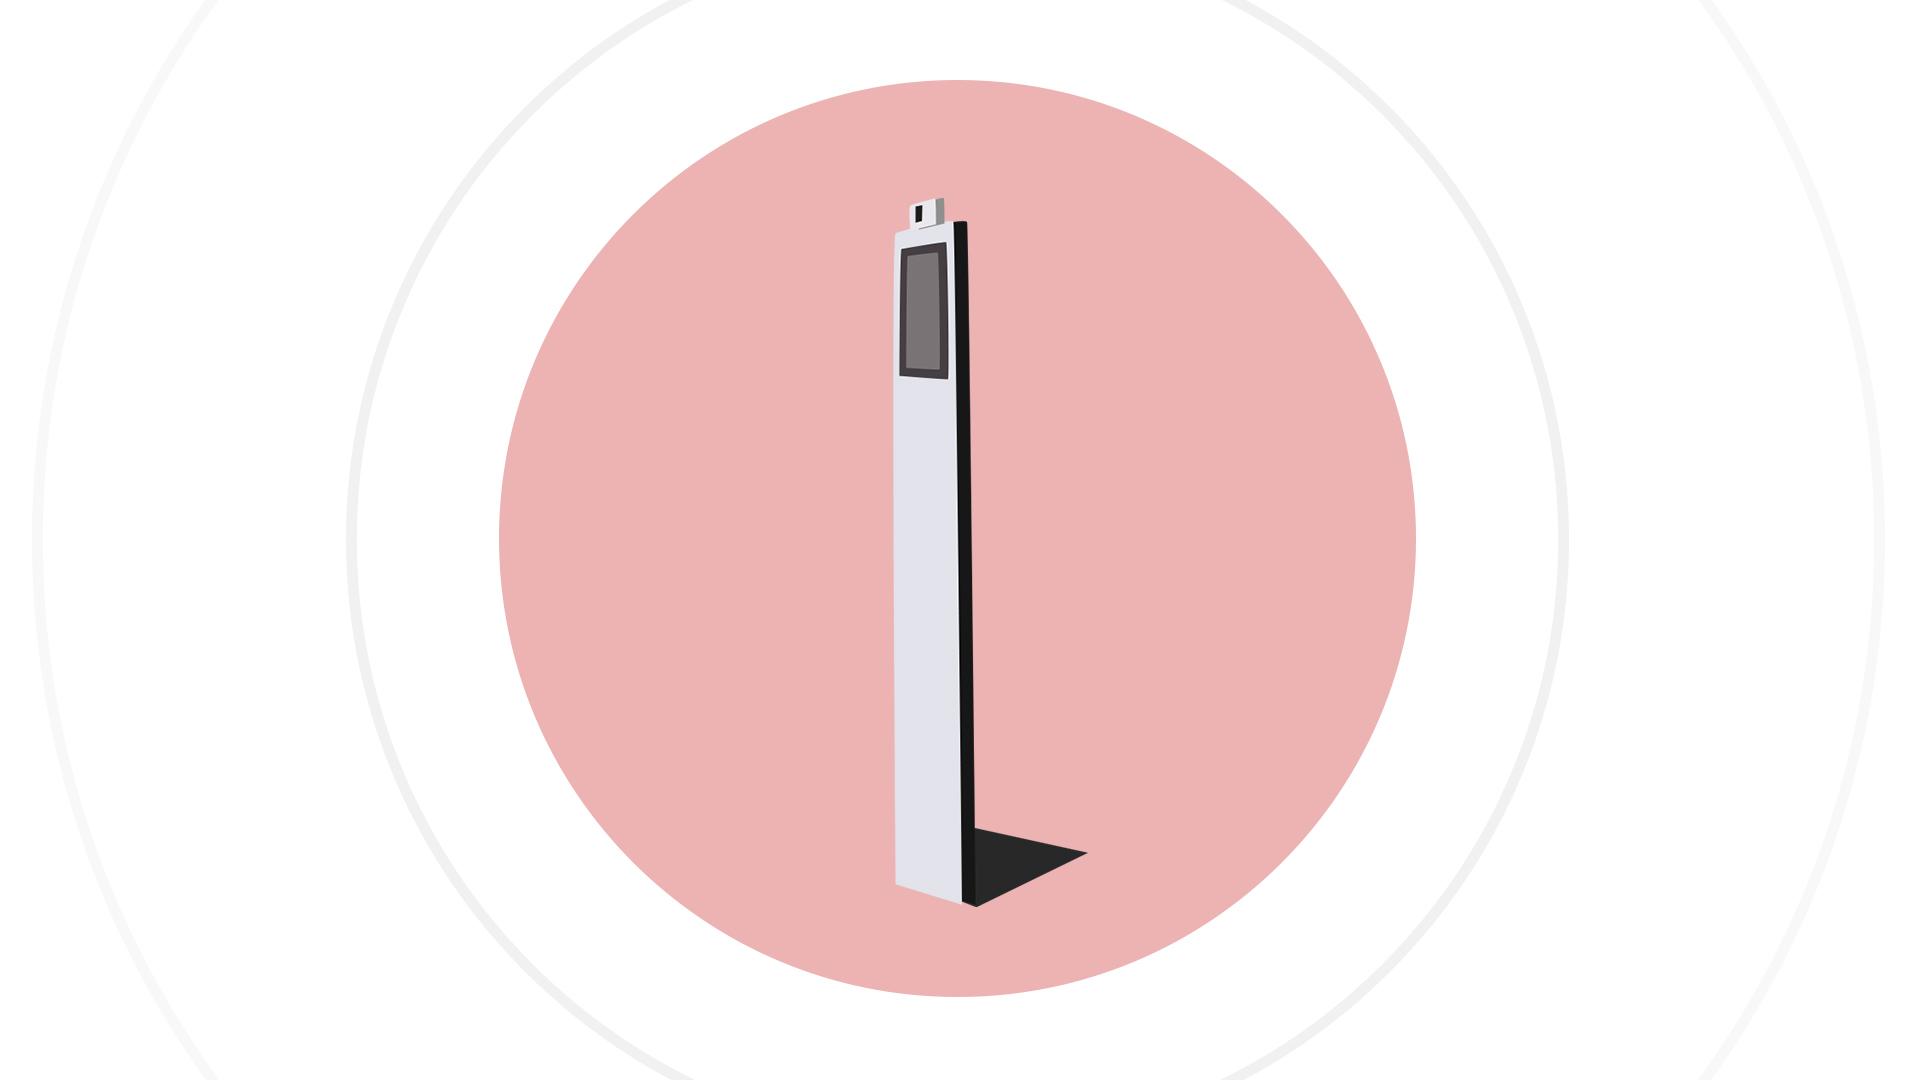 full body temperature camera for temperature testing. detect a high fever or normal body temperature